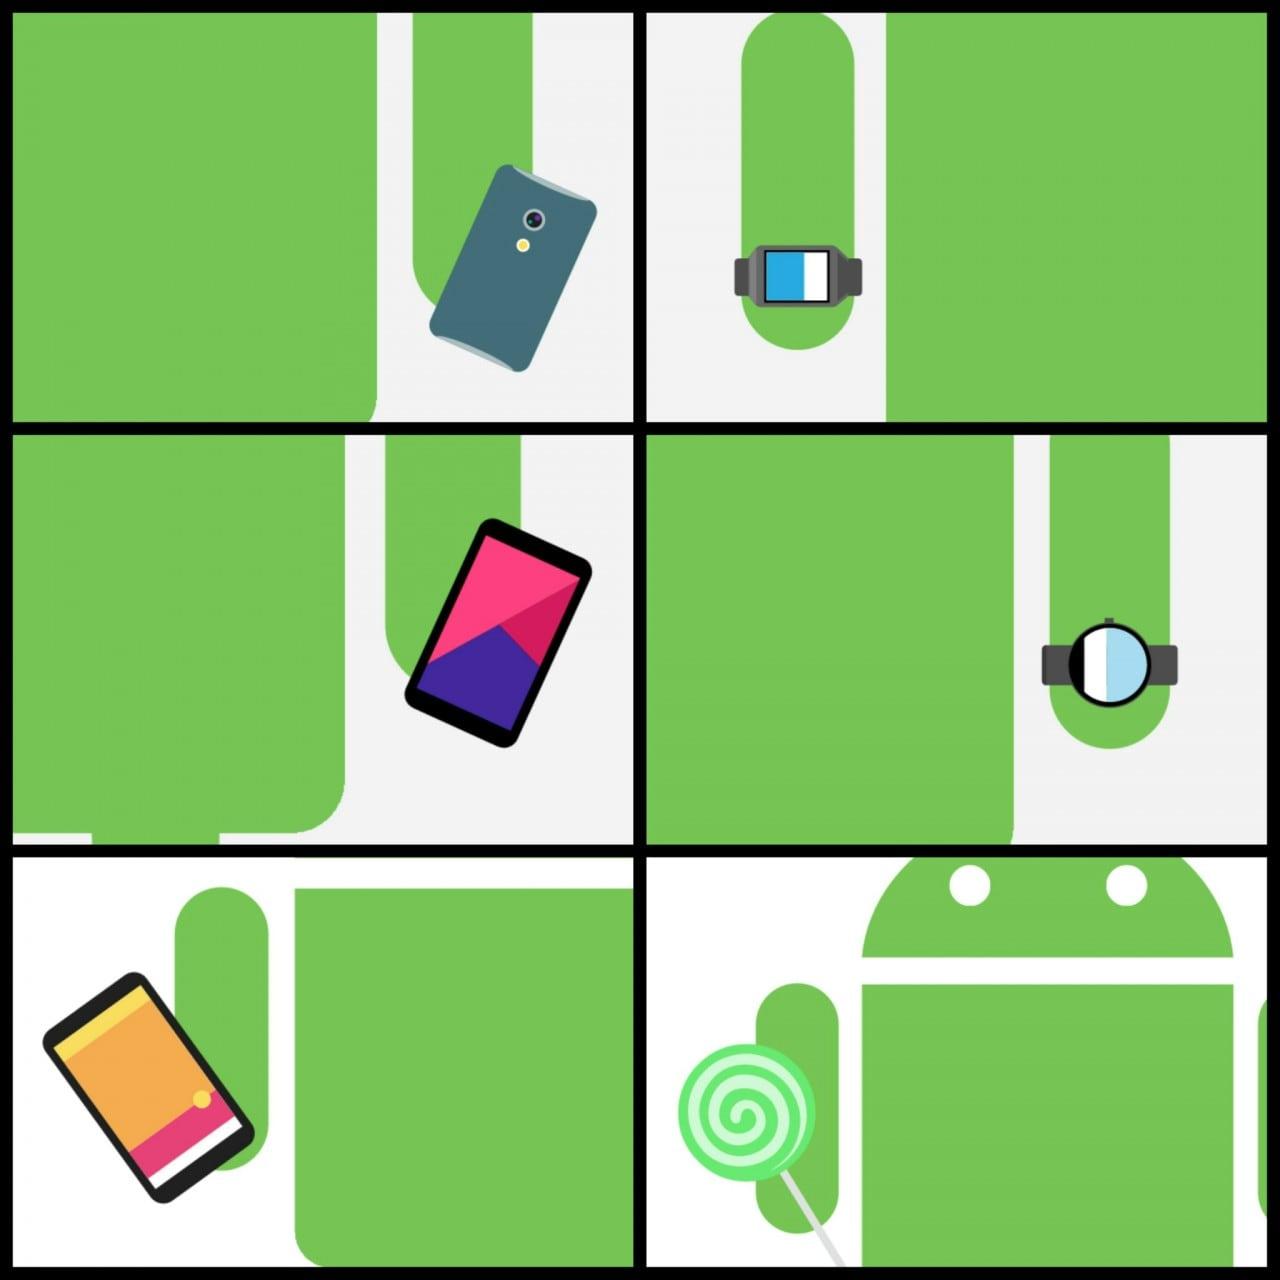 androidify teaser